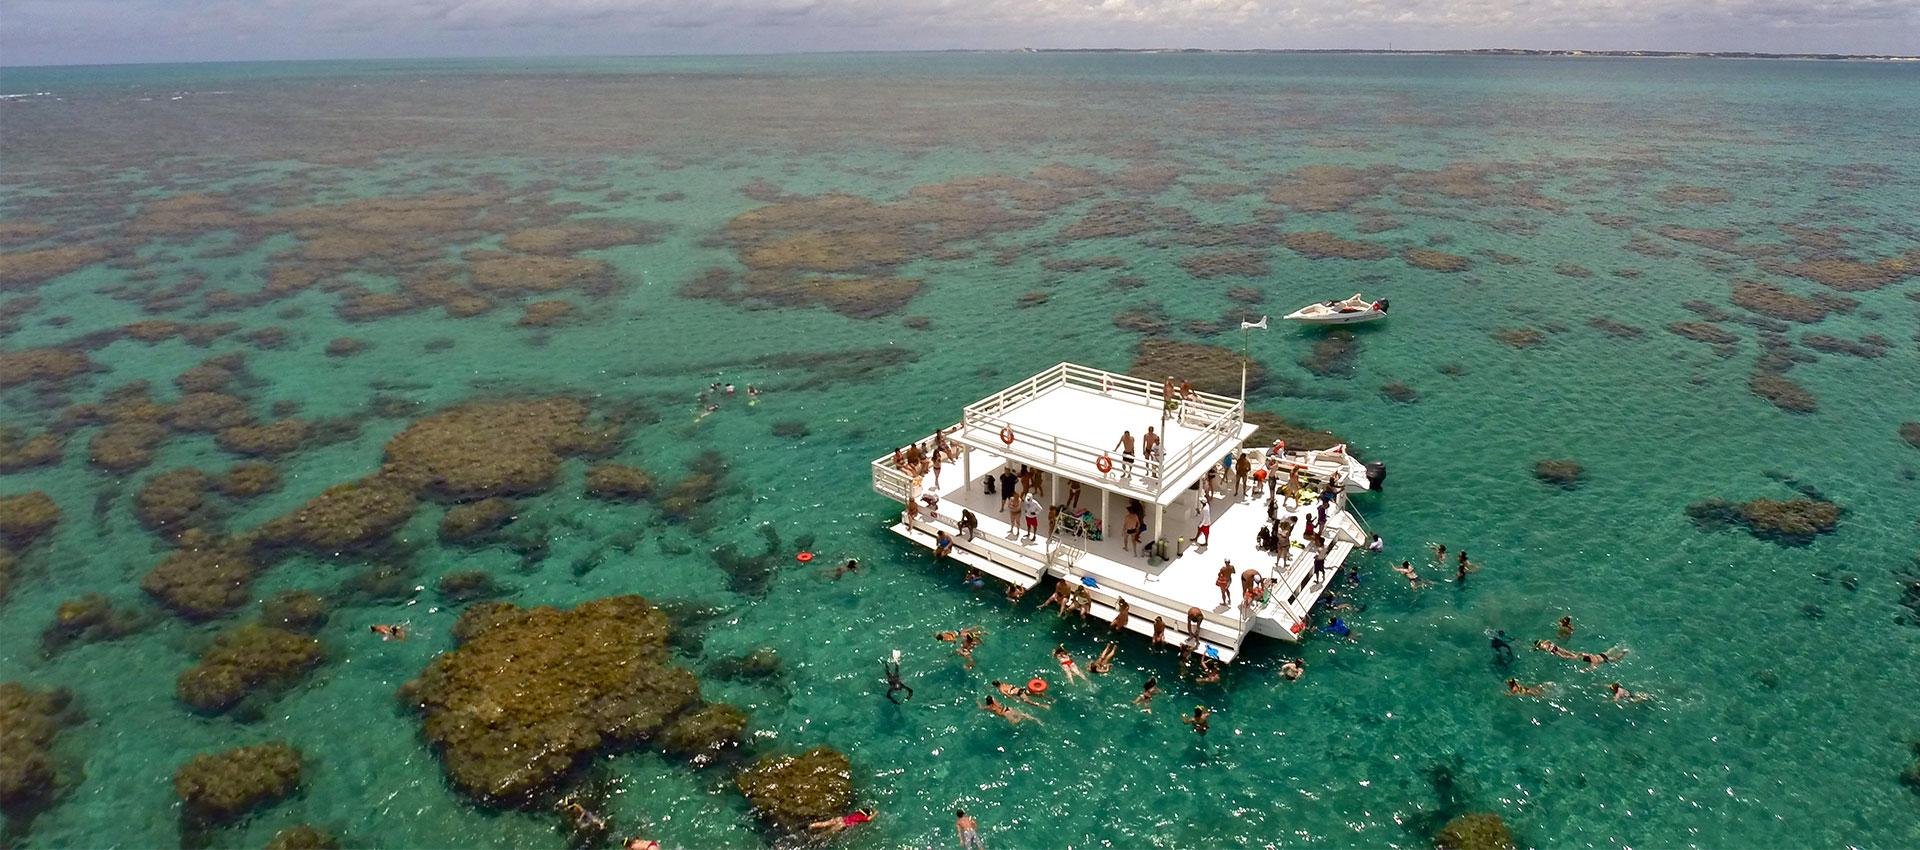 maracajaú - praias secretas do brasil